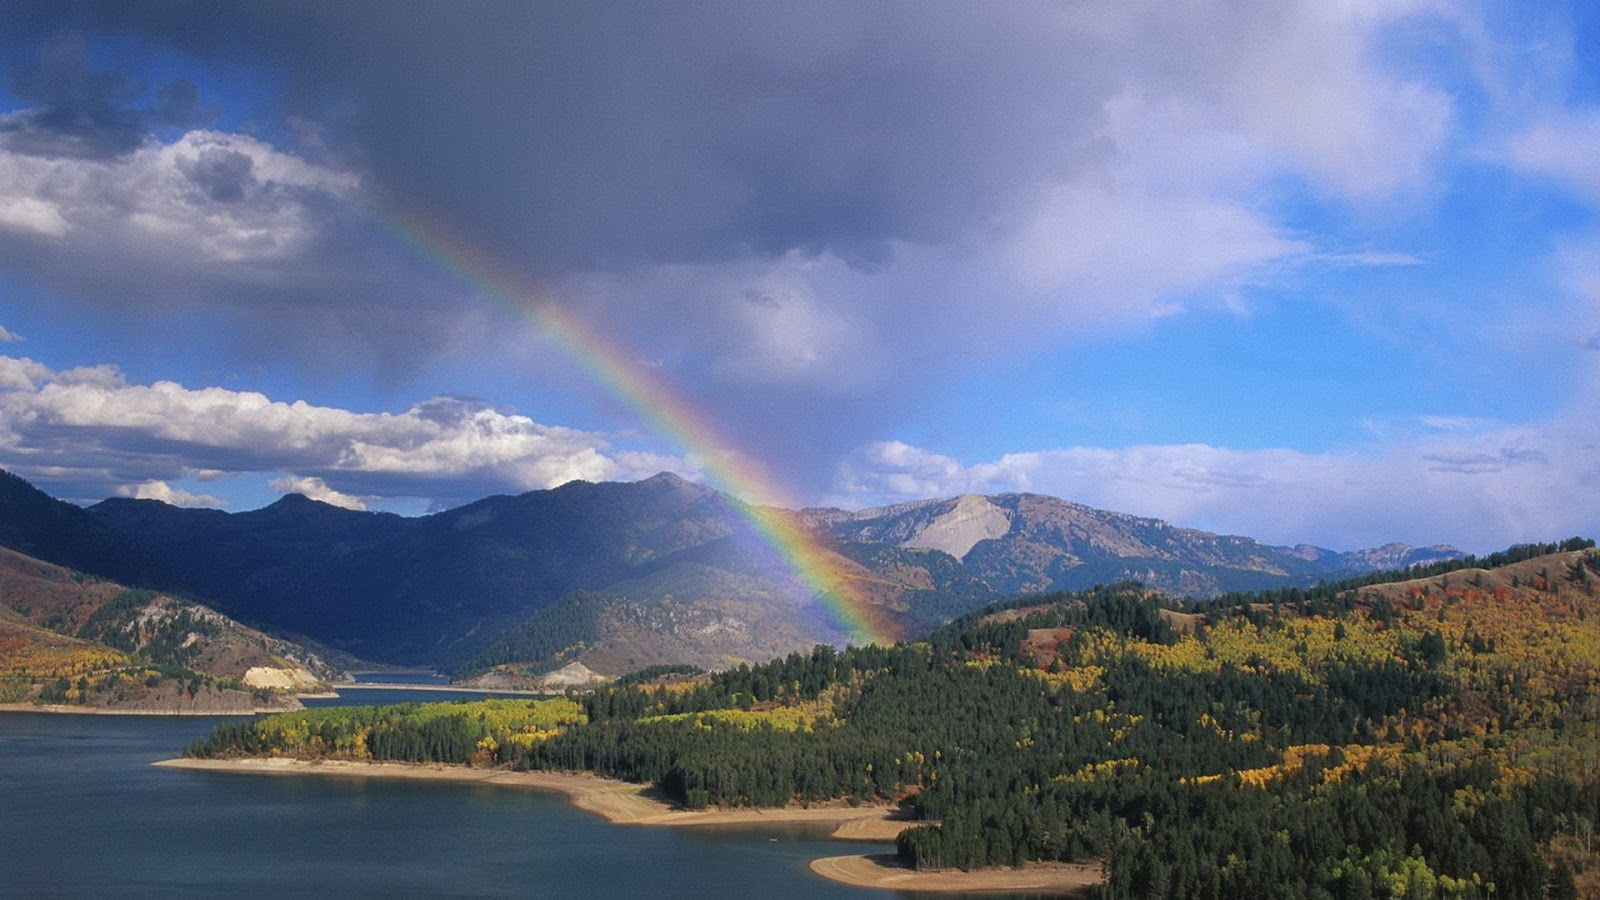 Rainbow Wallpapers Hd